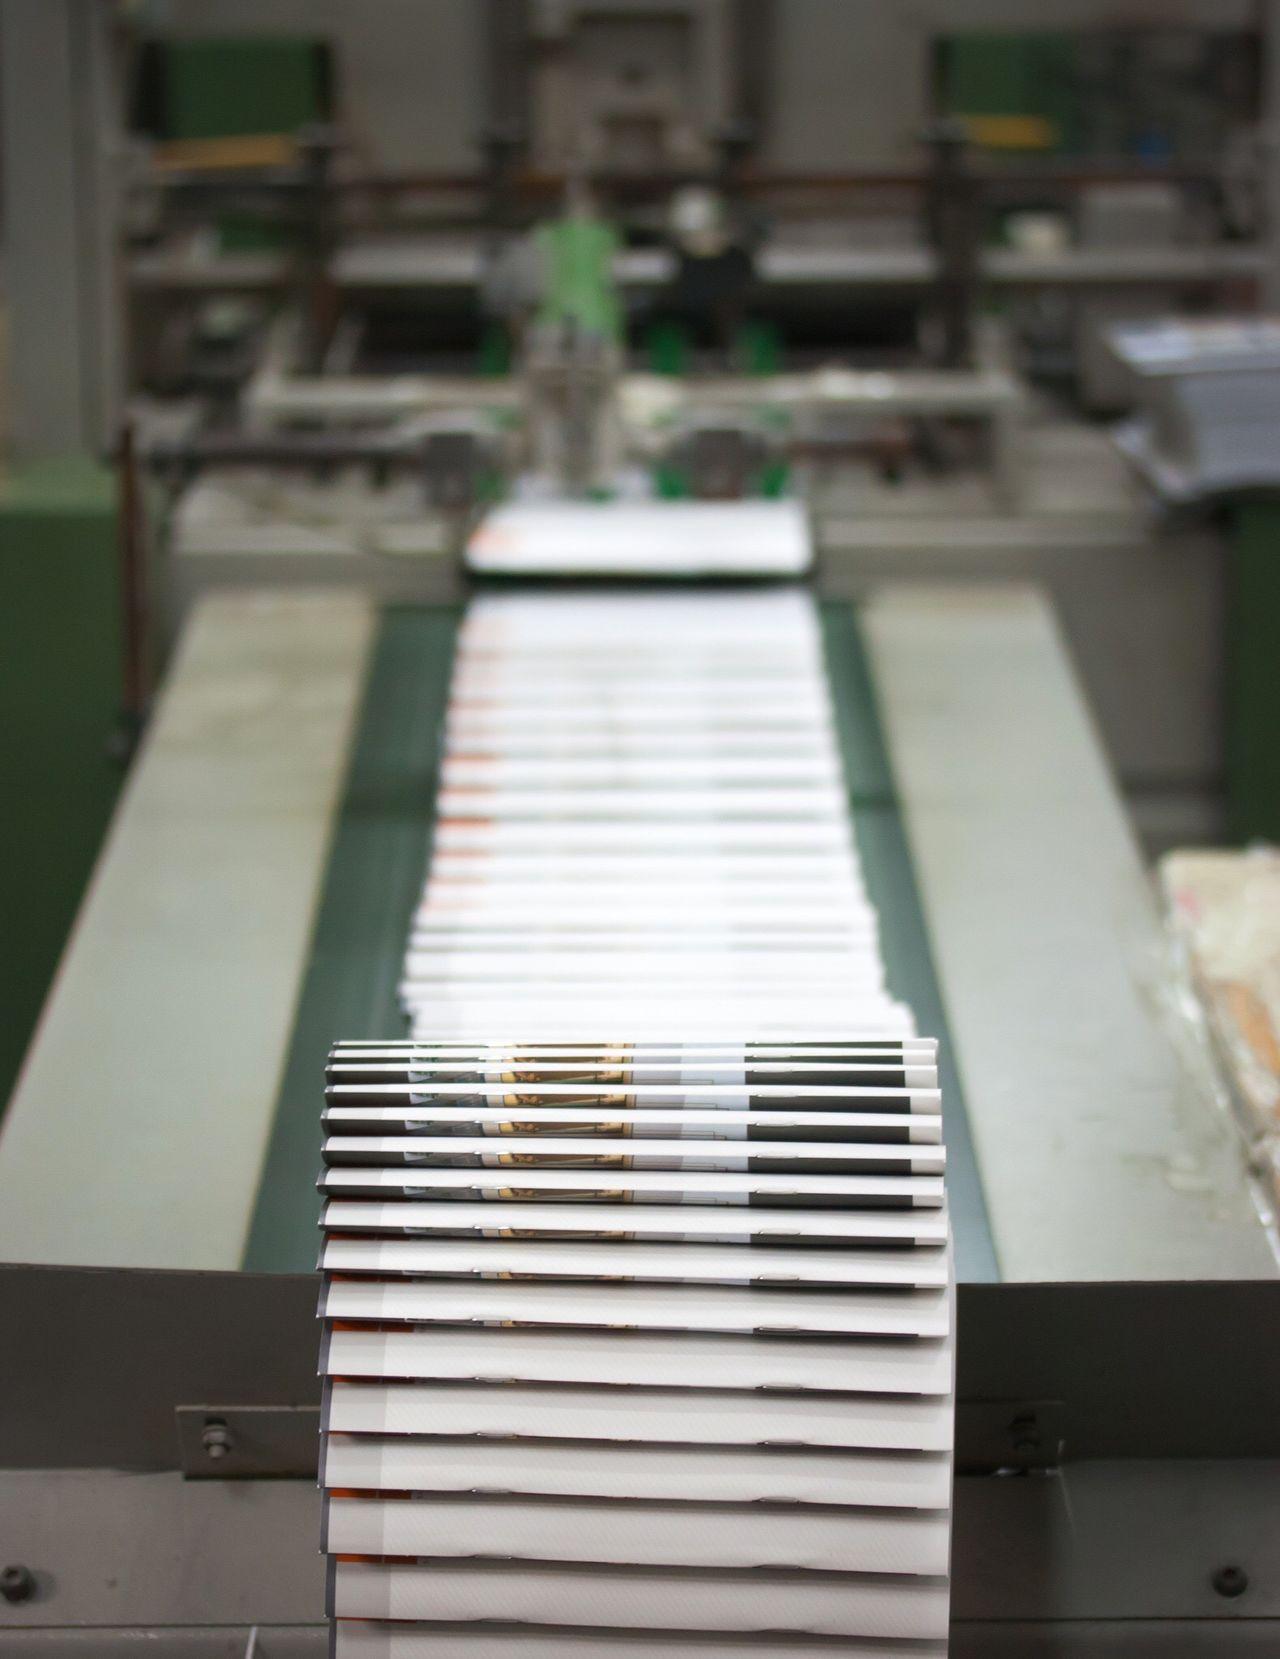 CMYK Print Printing Press Printing Printing Machine Printingpress Printing House Offset Press Offset Printing Paper Book Production Process